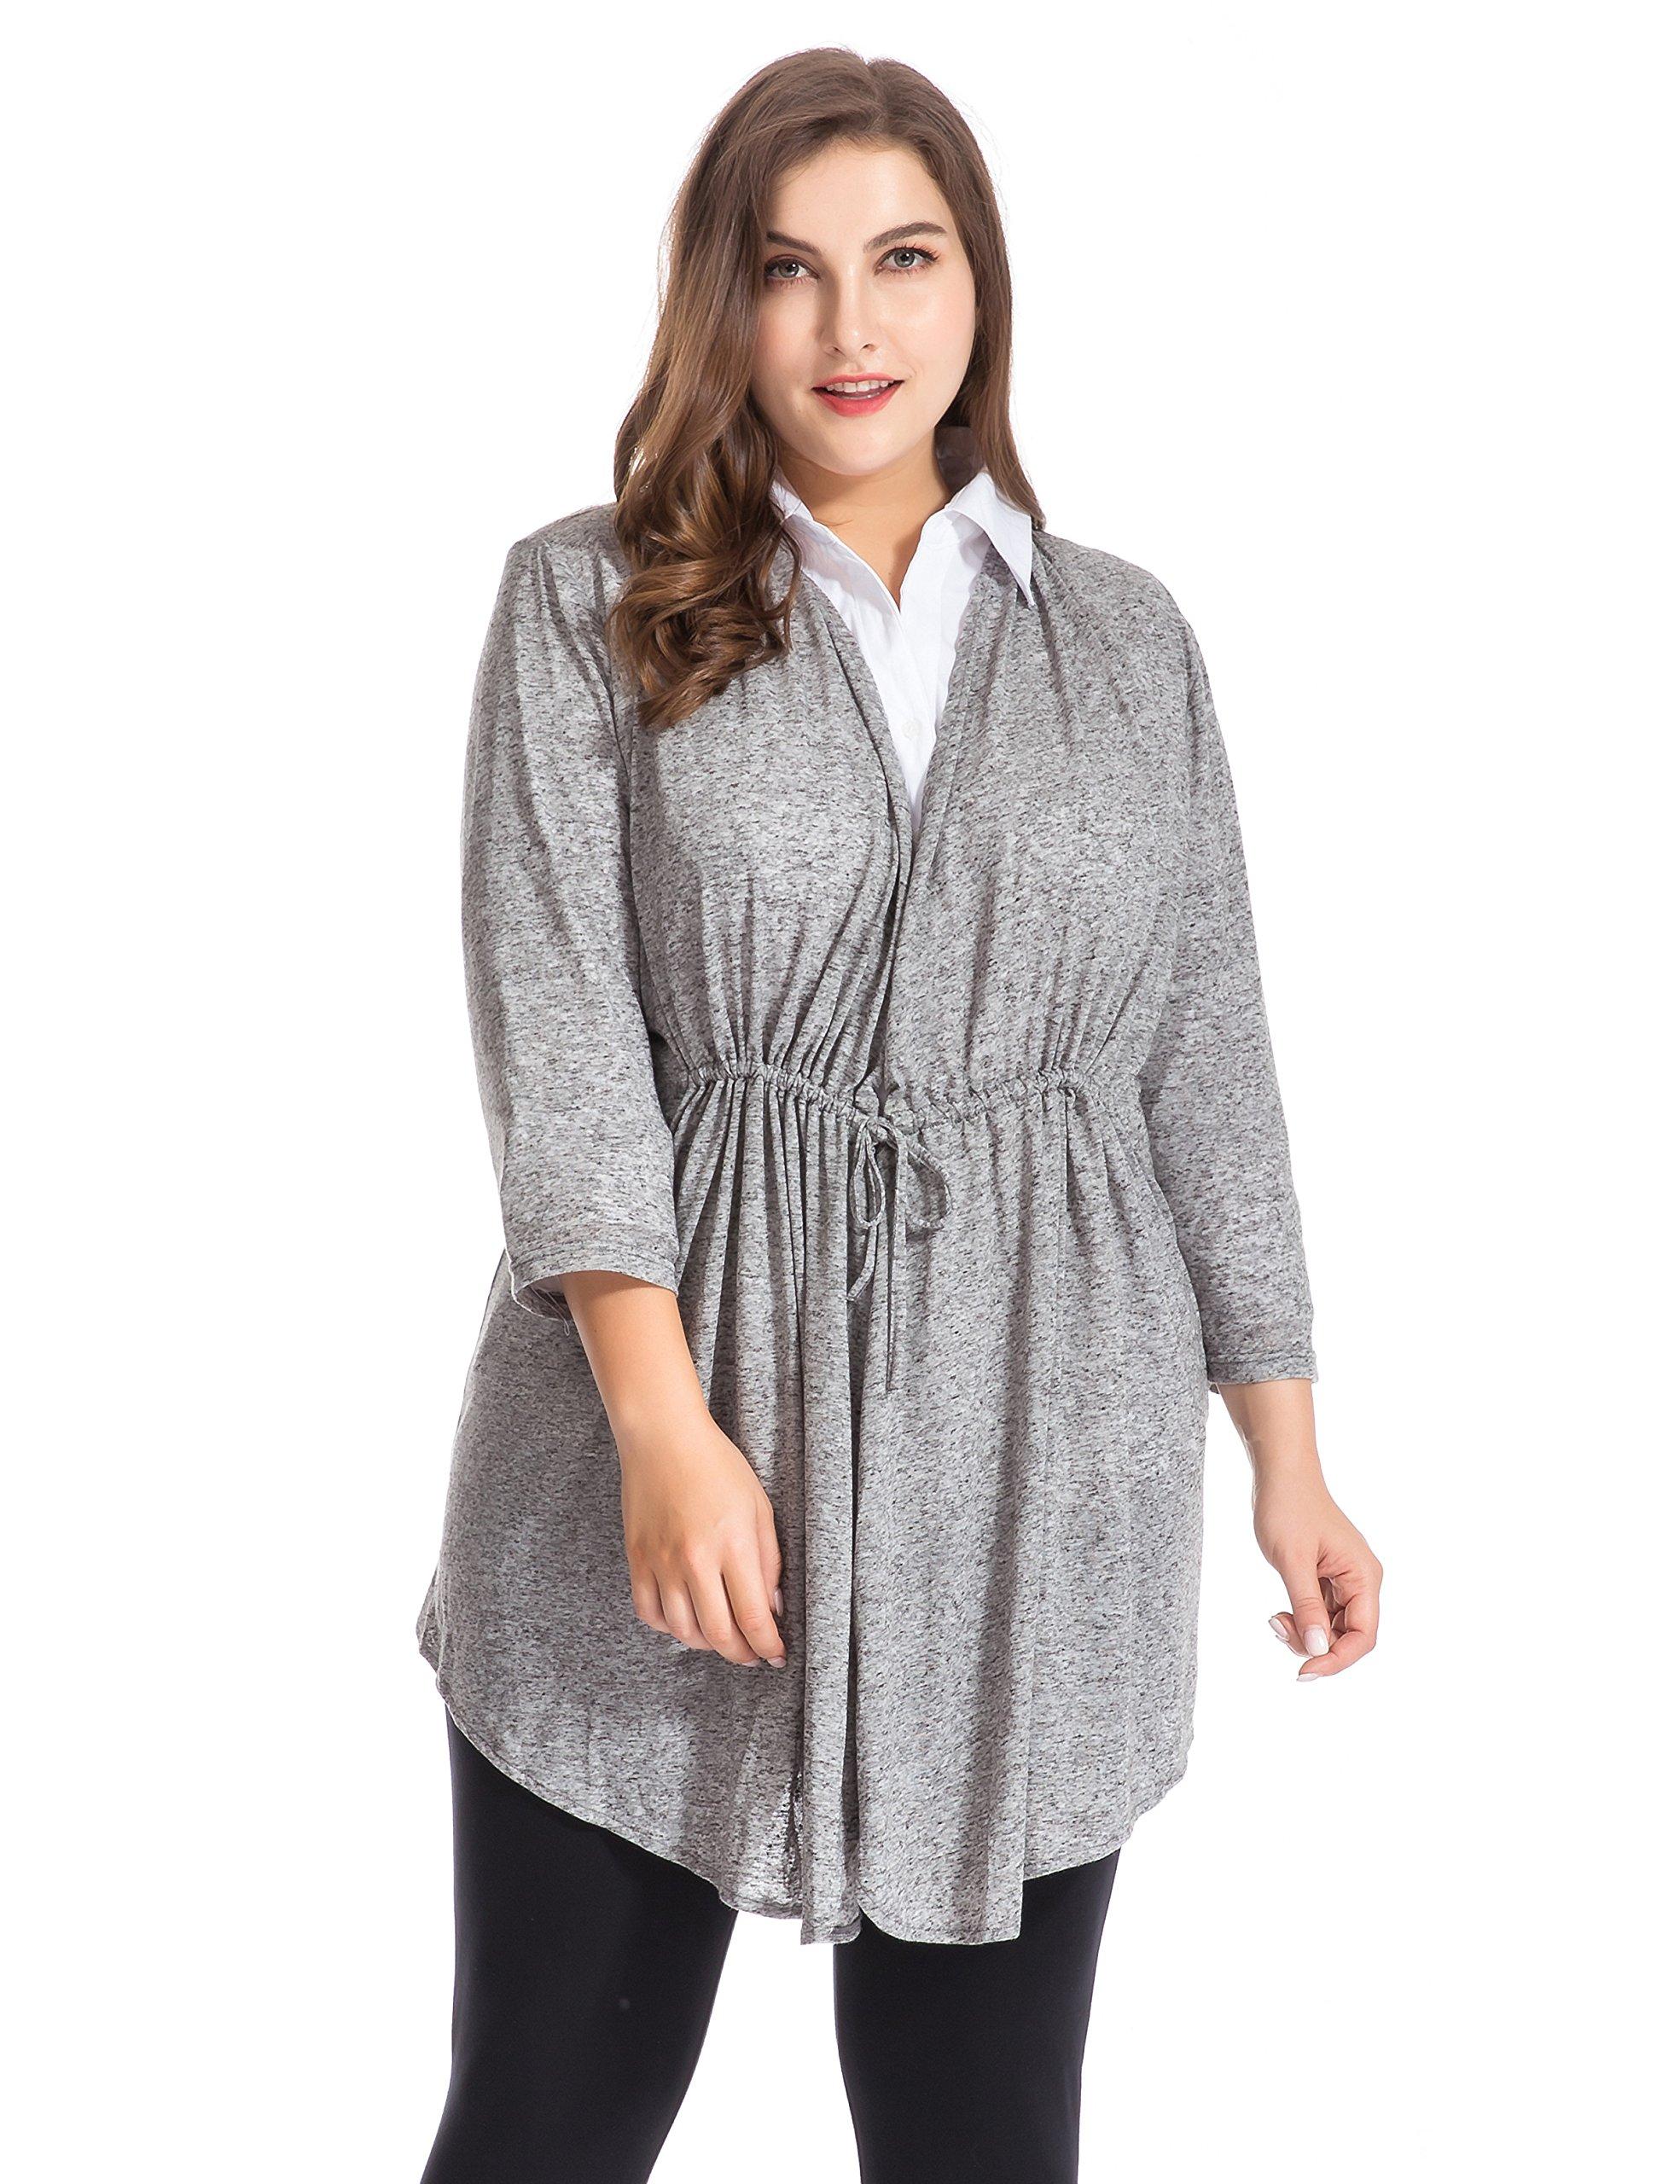 Chicwe Women's Plus Size Linen Jersey Bellini Cardigan Style Top 1X